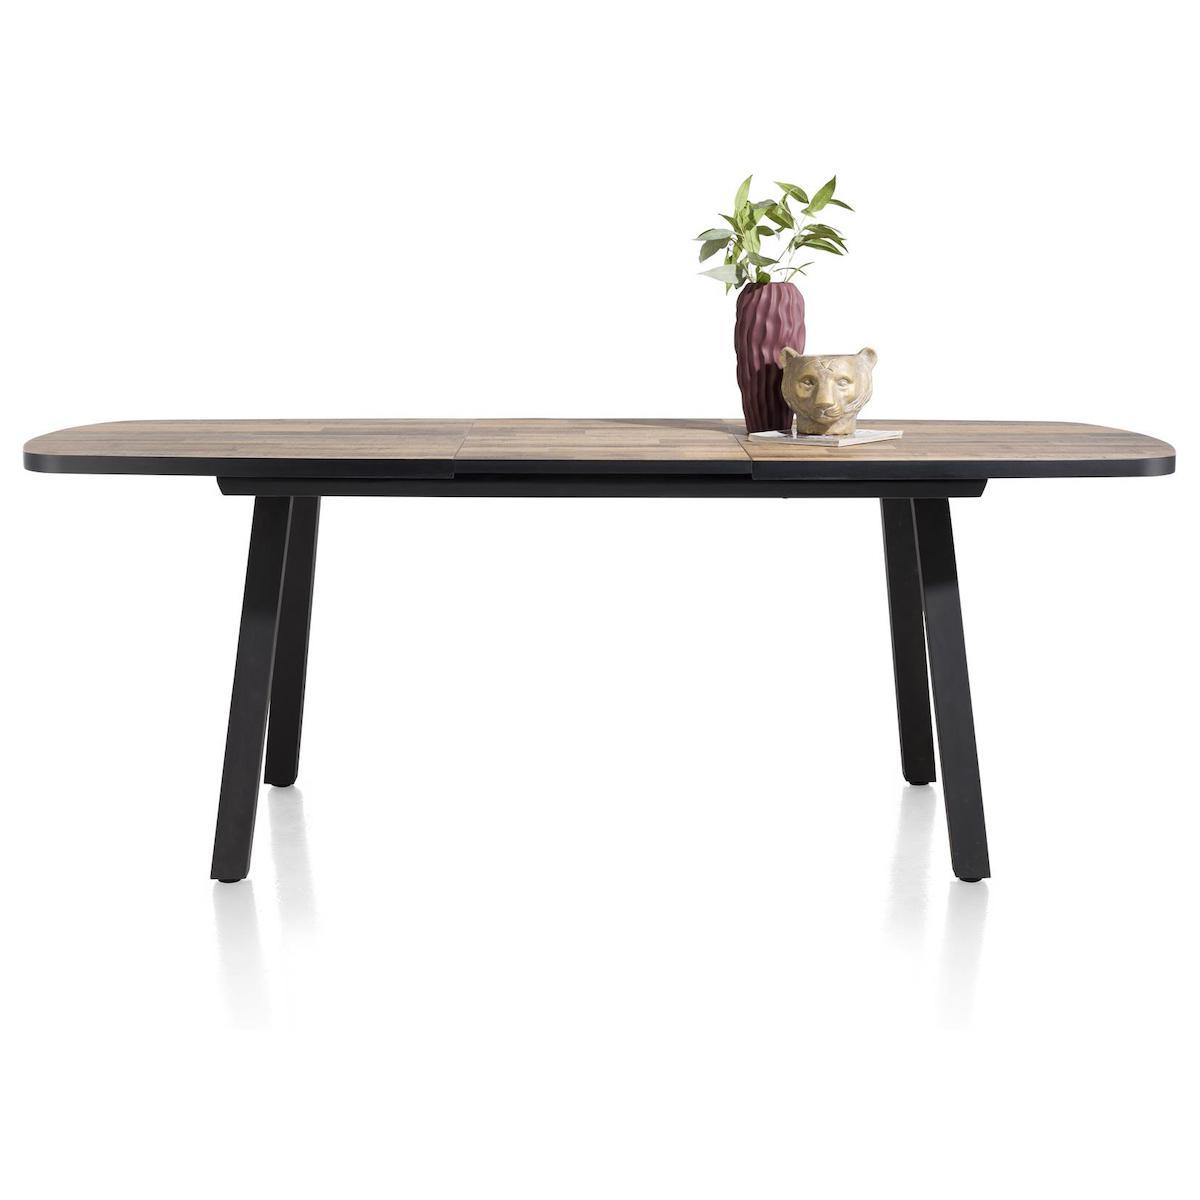 Table de bar extensible ovale 110x190/250cm AVALOX Henders & Hazel driftwood-pieds simple